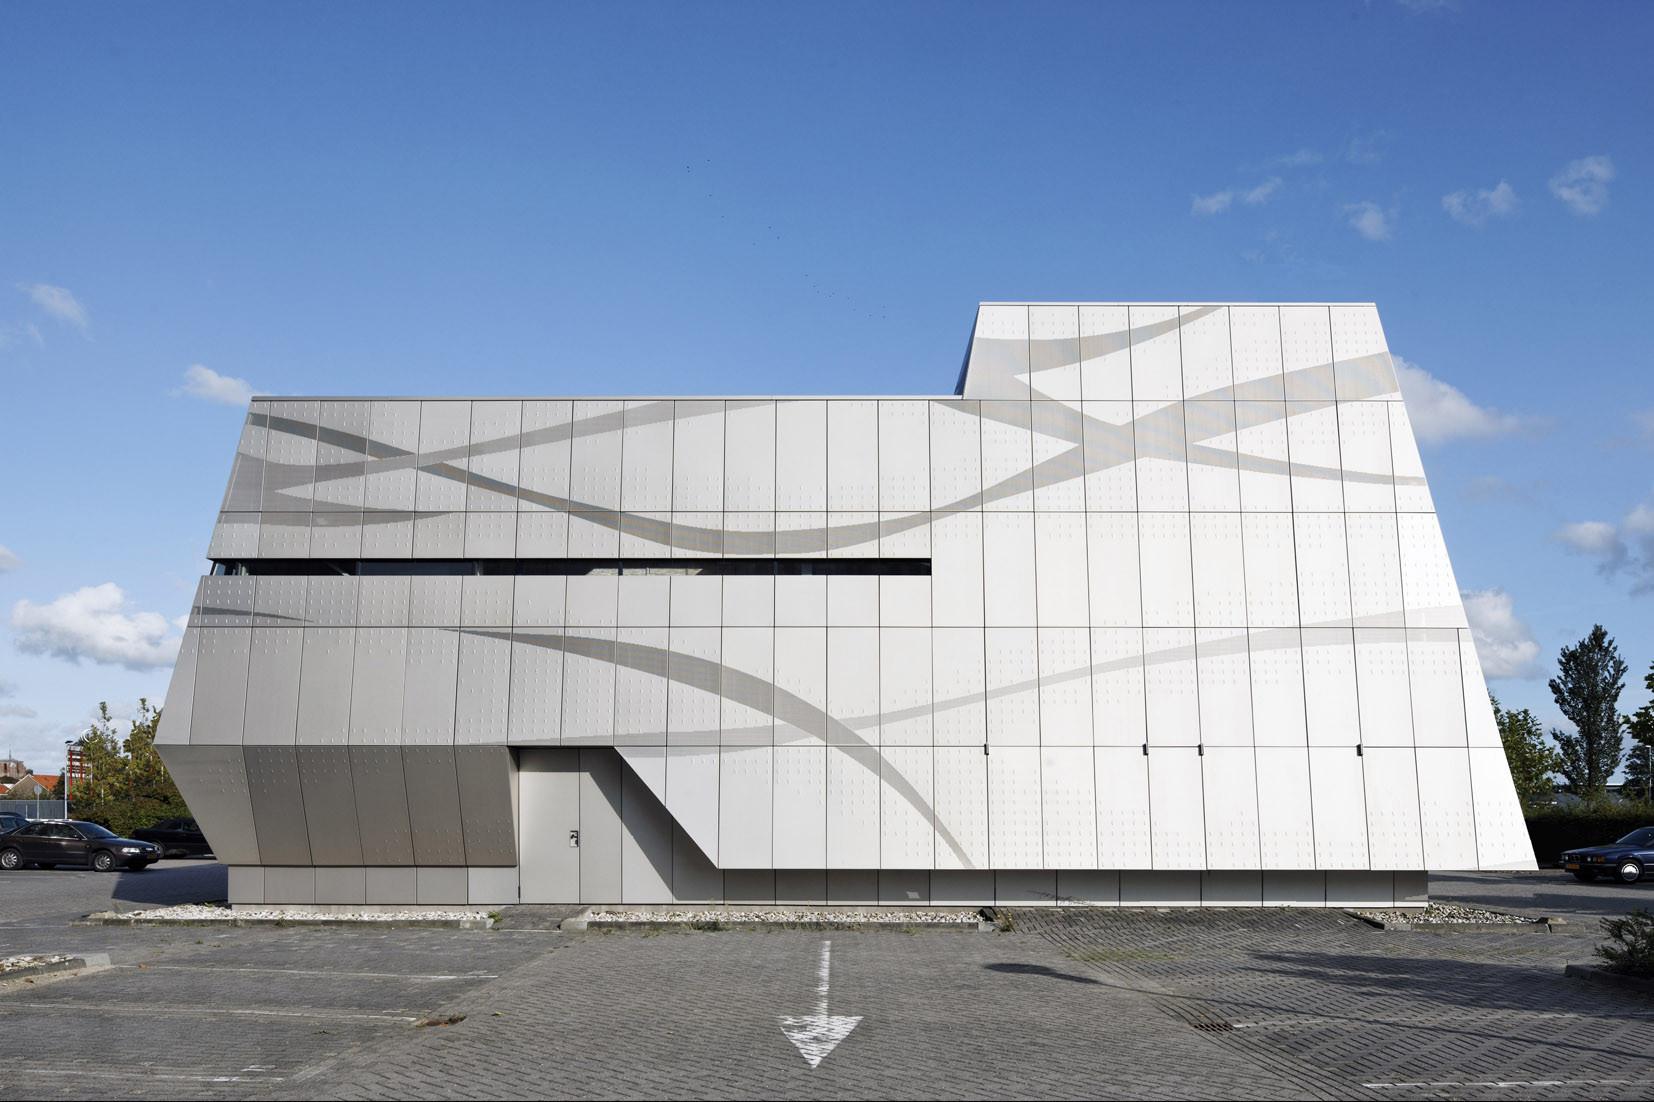 Depósito de Arquivos / Bekkering Adams Architects, © René de Wit